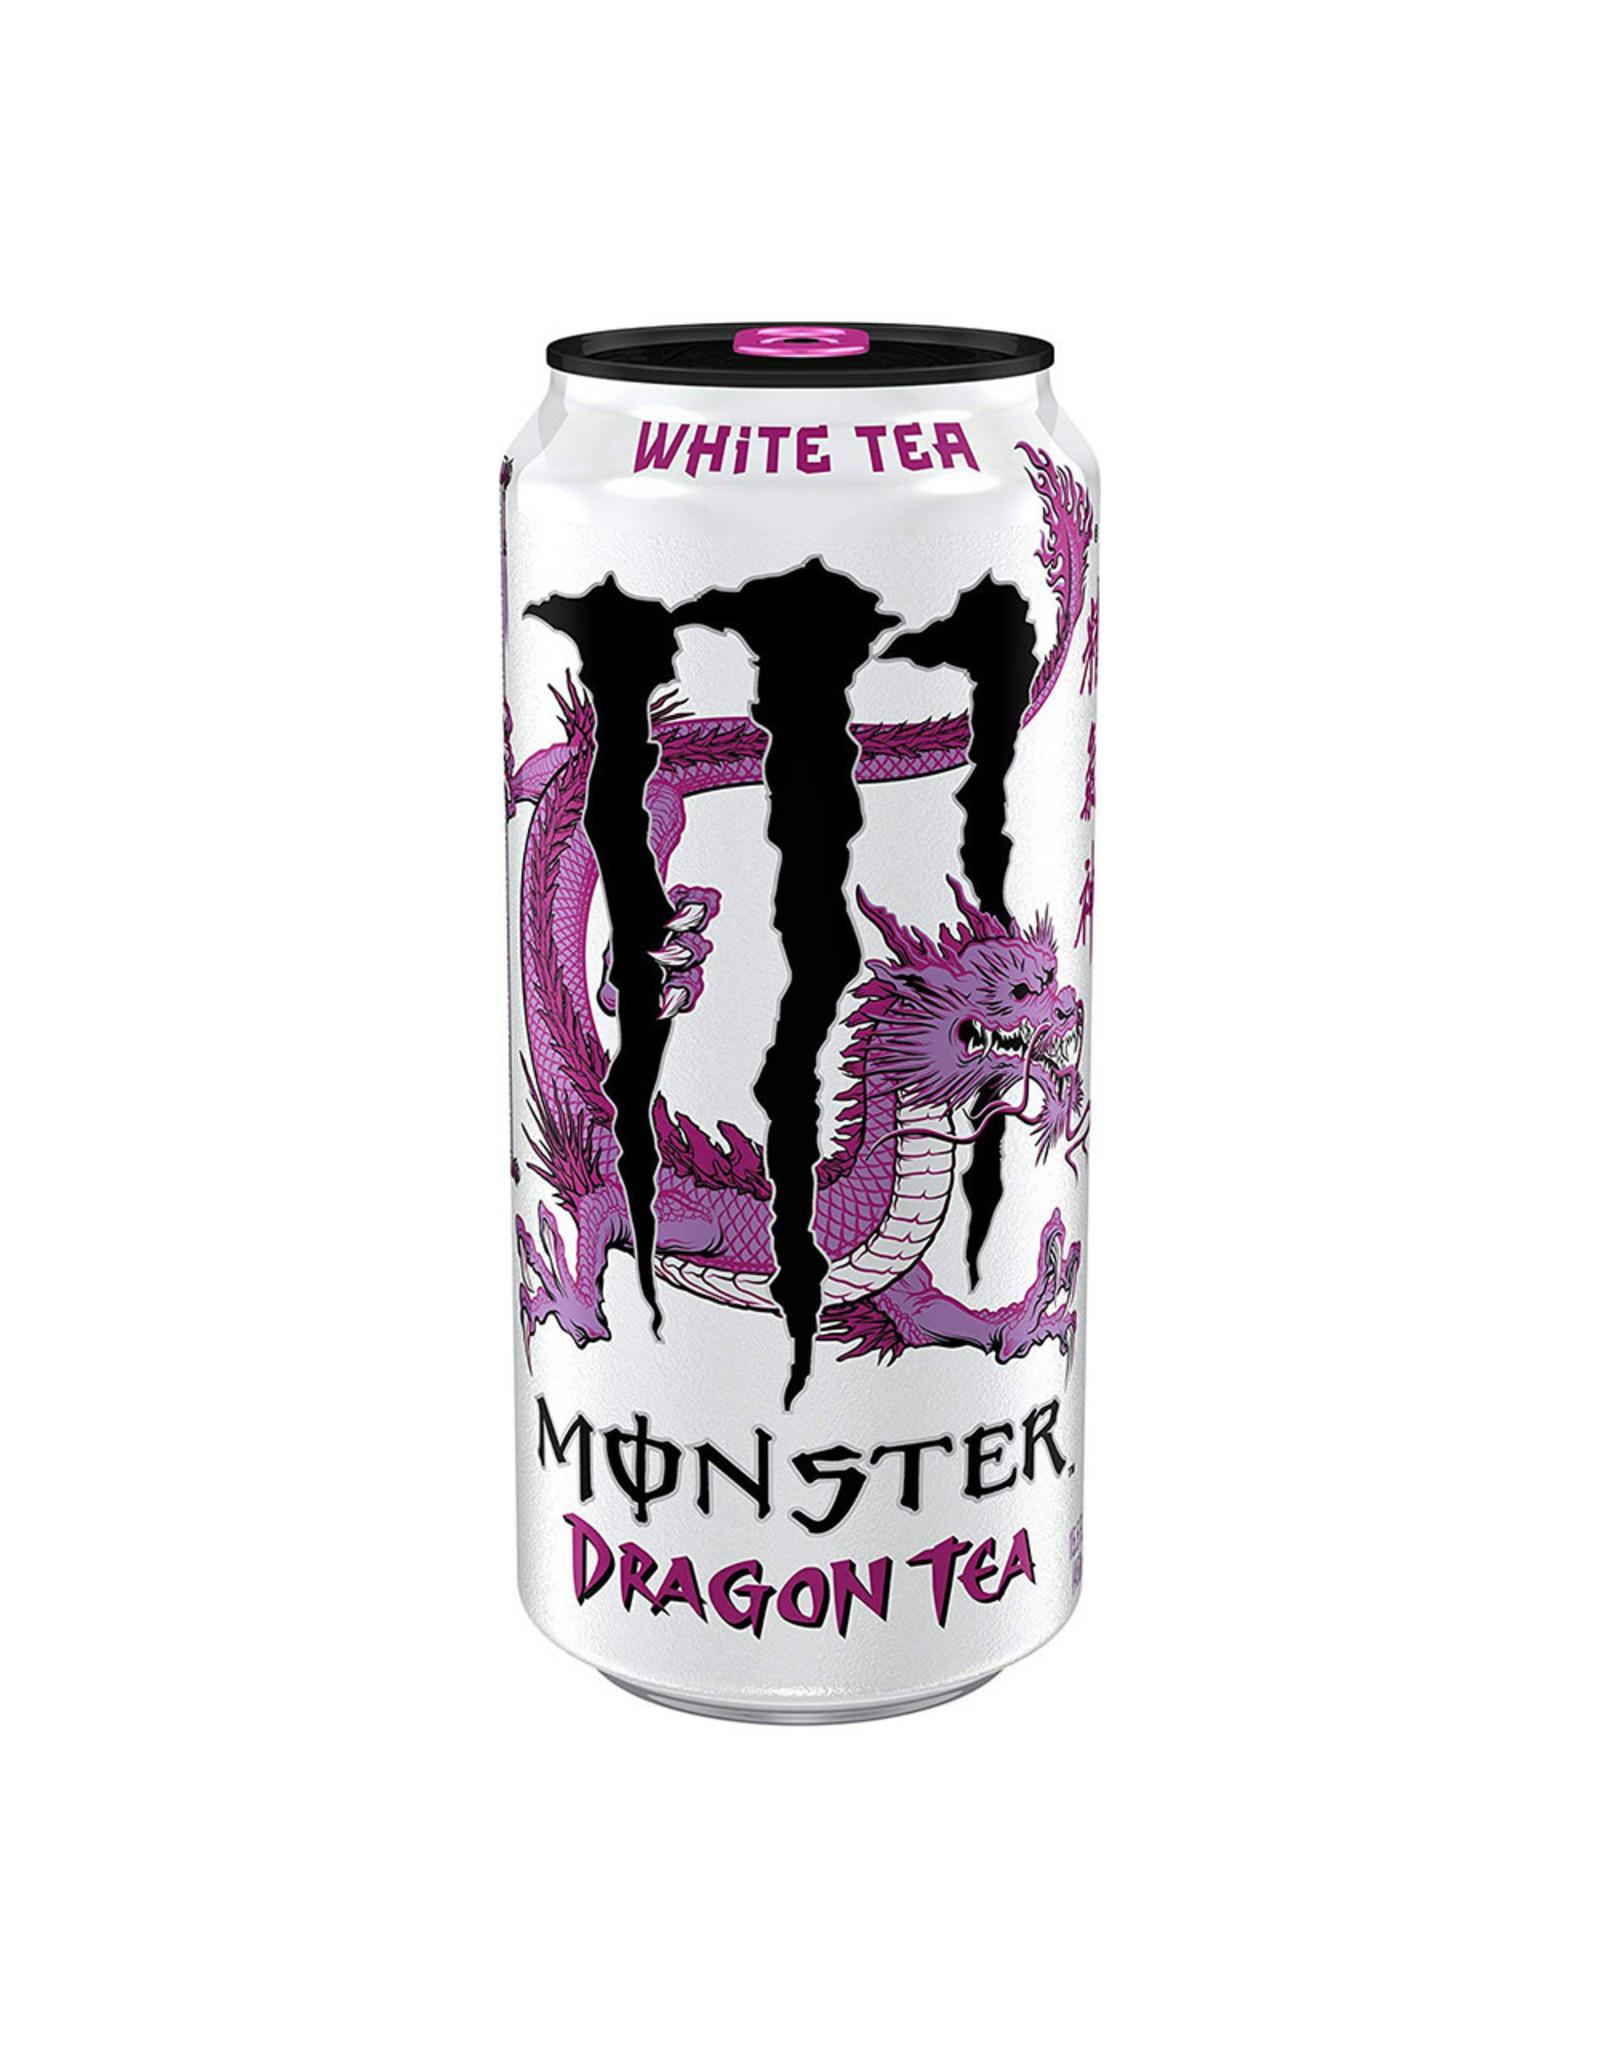 Monster Dragon Tea - White Dragon Tea (import) - 473ml